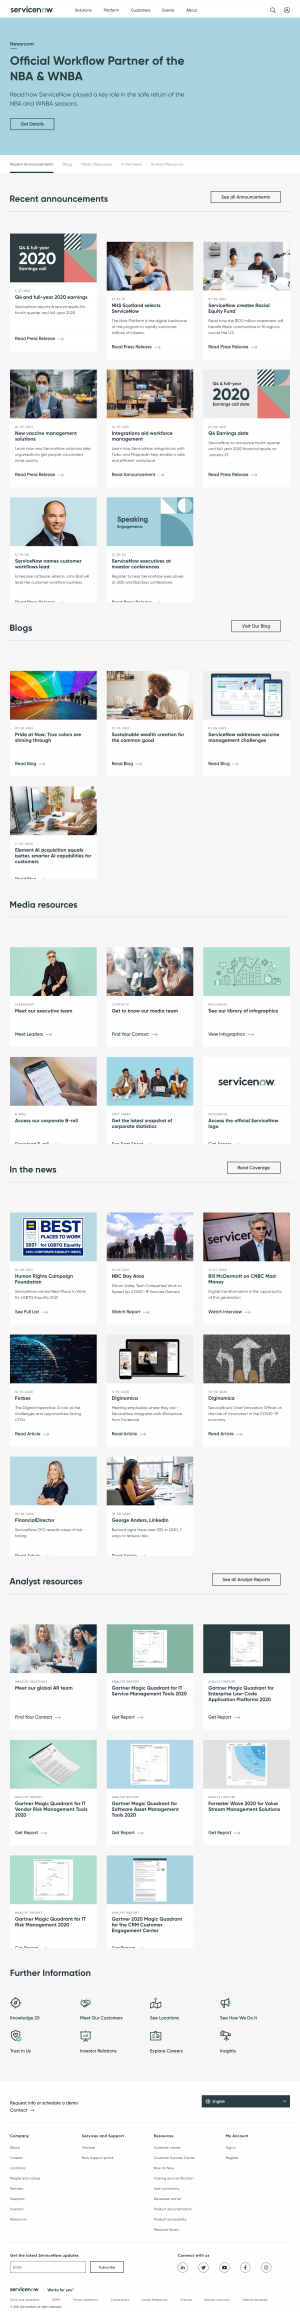 ServiceNow – Newsroom